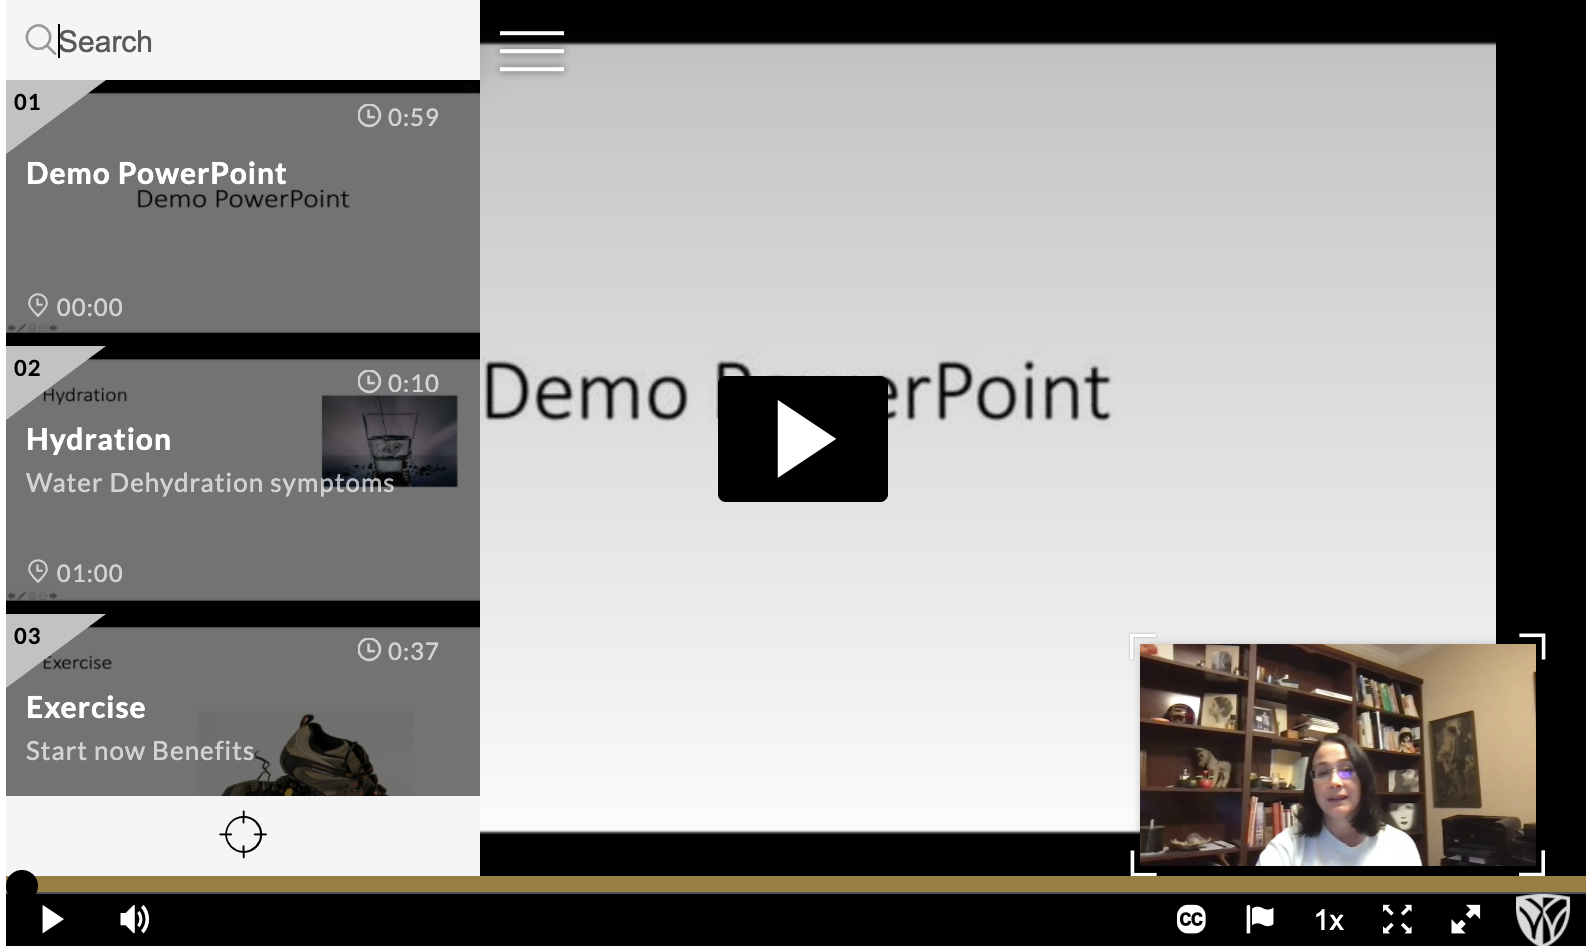 Screenshot of a Kaltura Capture video showing PowerPoint slide navigation on left